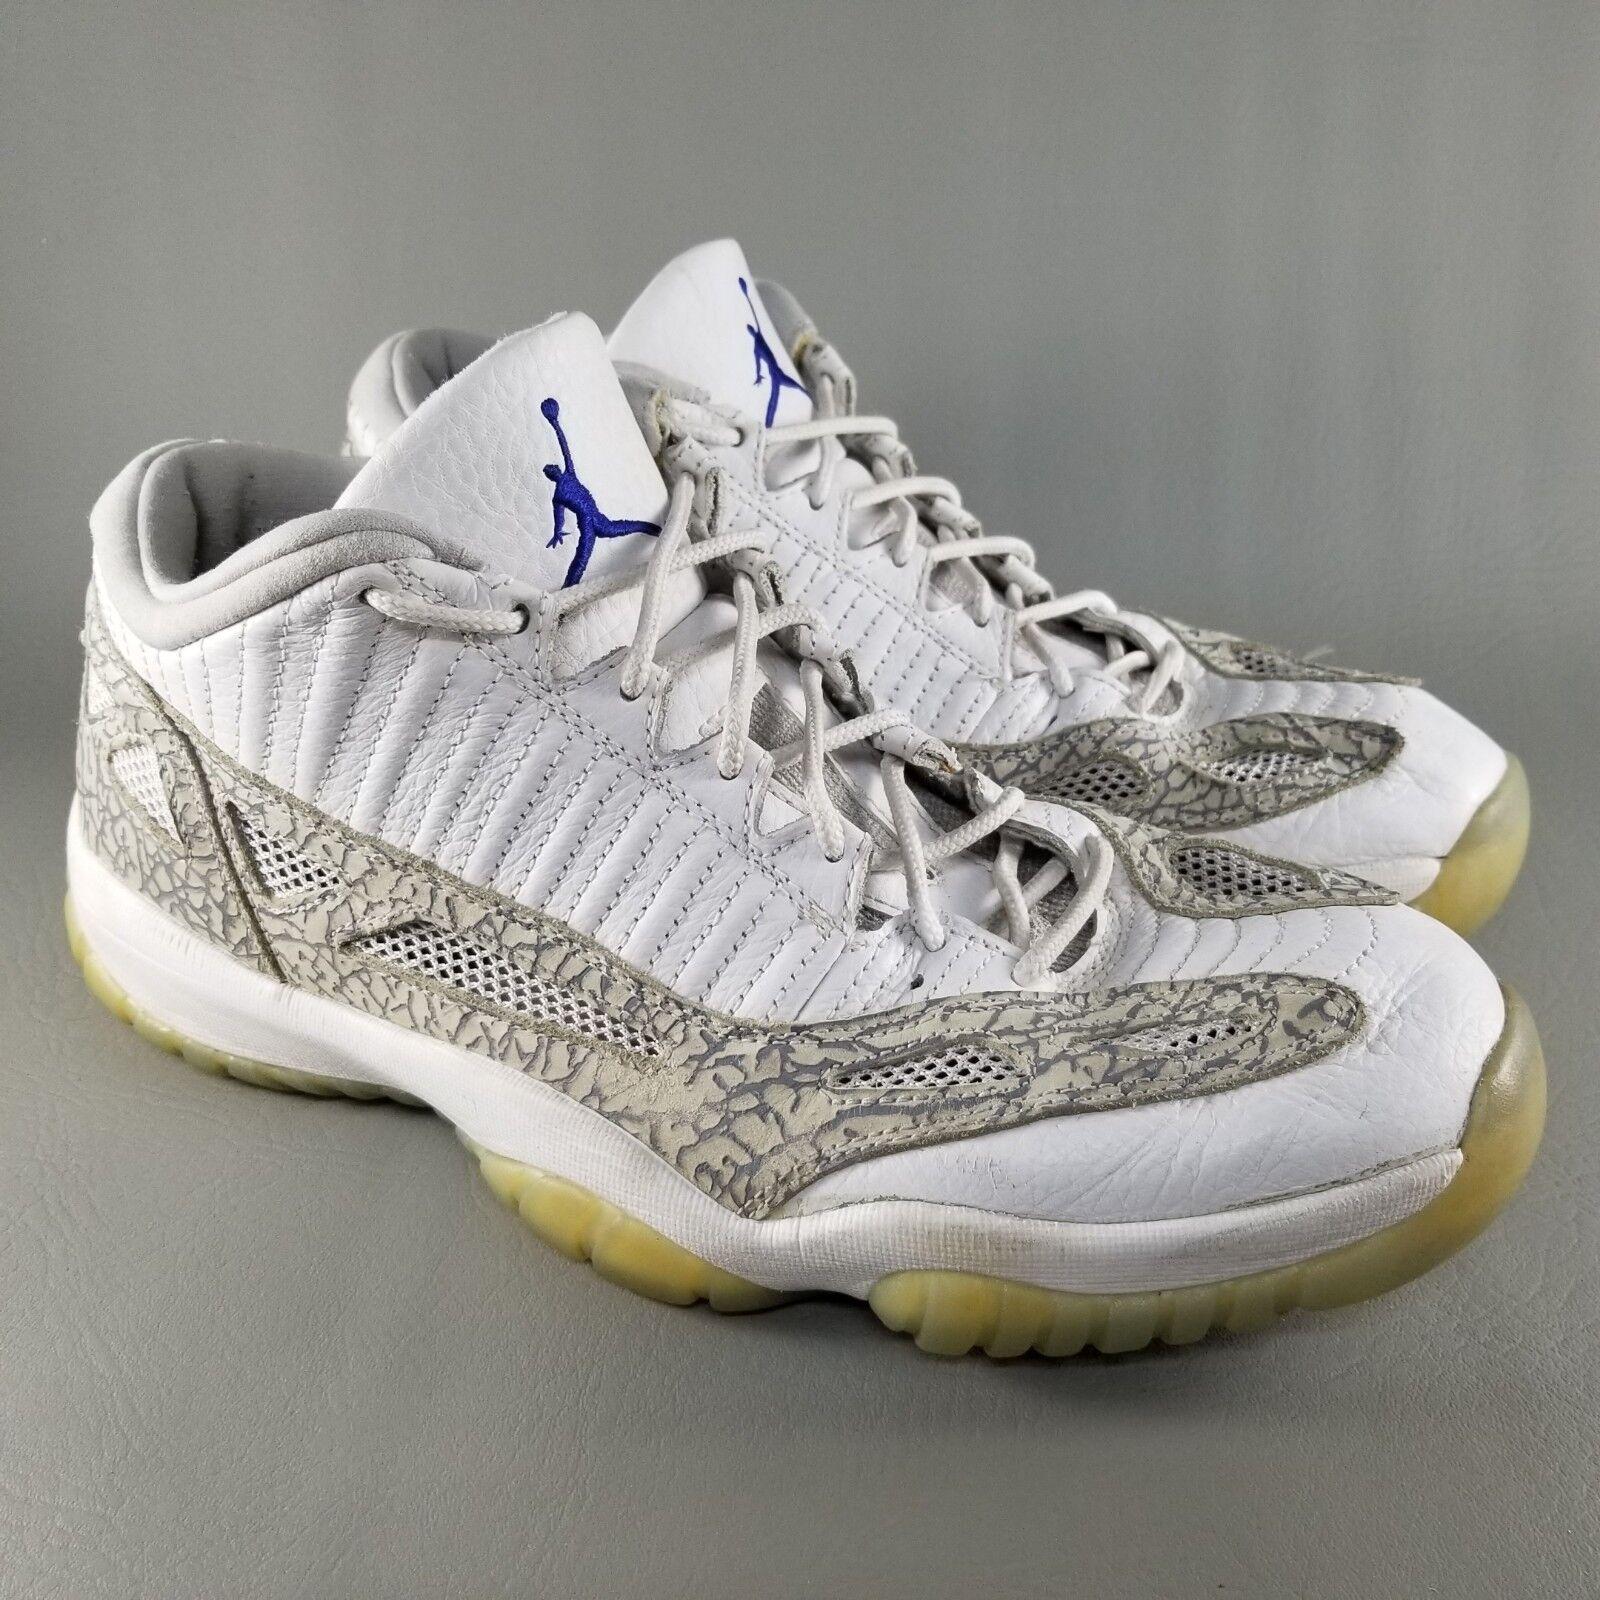 Nike Air SZ Jordan 11 XI Retro Low Mens SZ Air 12 Basketball Shoes Sneakers White Gray 632e9f